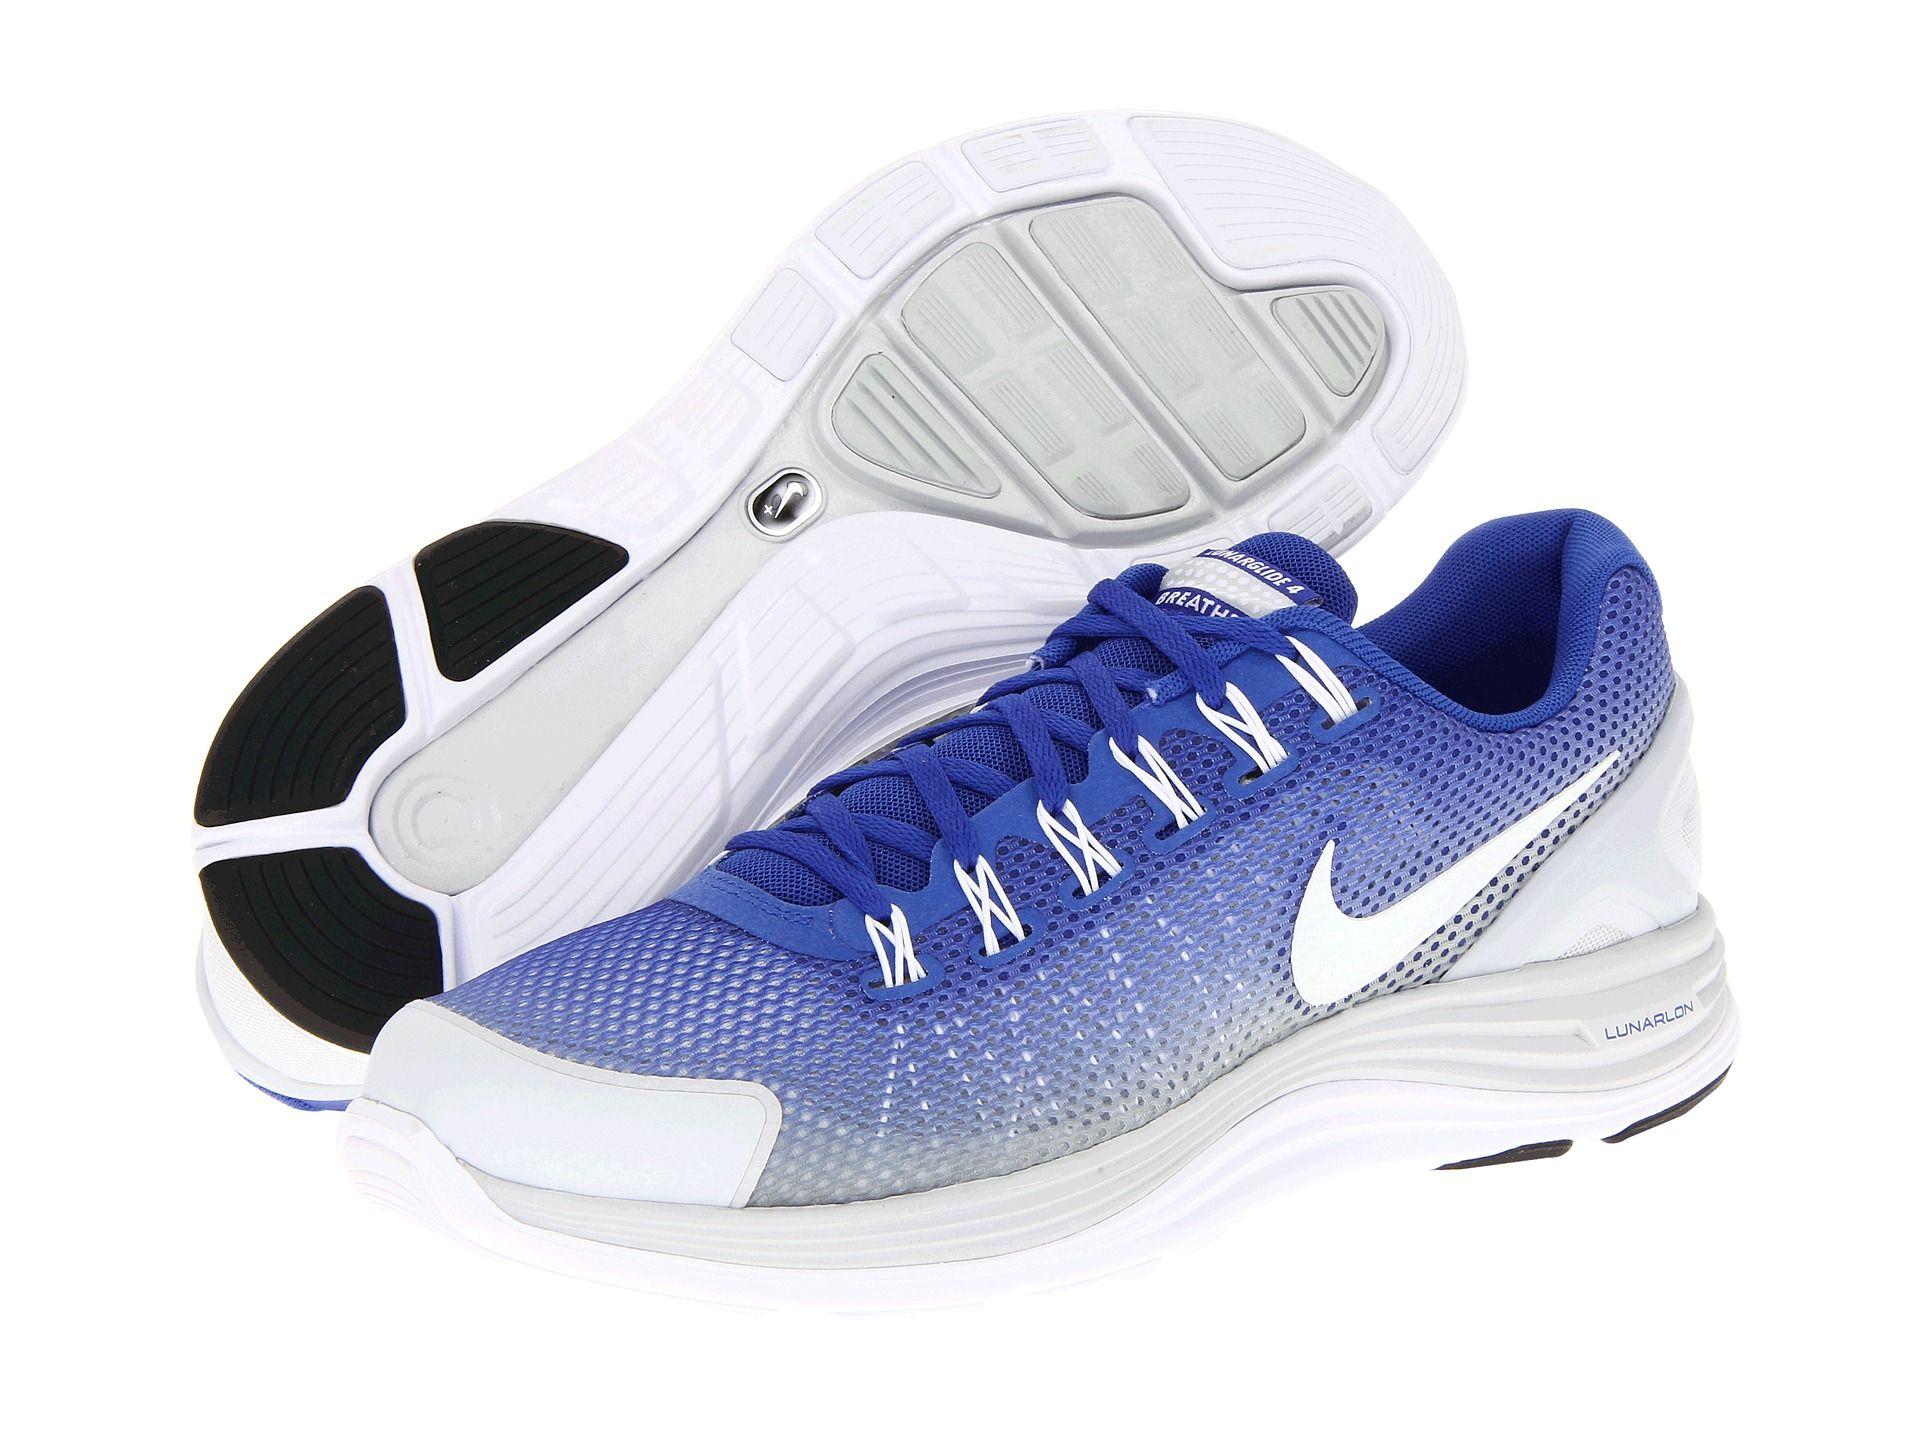 Nike Lunarglide+ 4 Breathe Hyper Blue/Pure Platinum/White - Zappos.com Free Shipping BOTH Ways